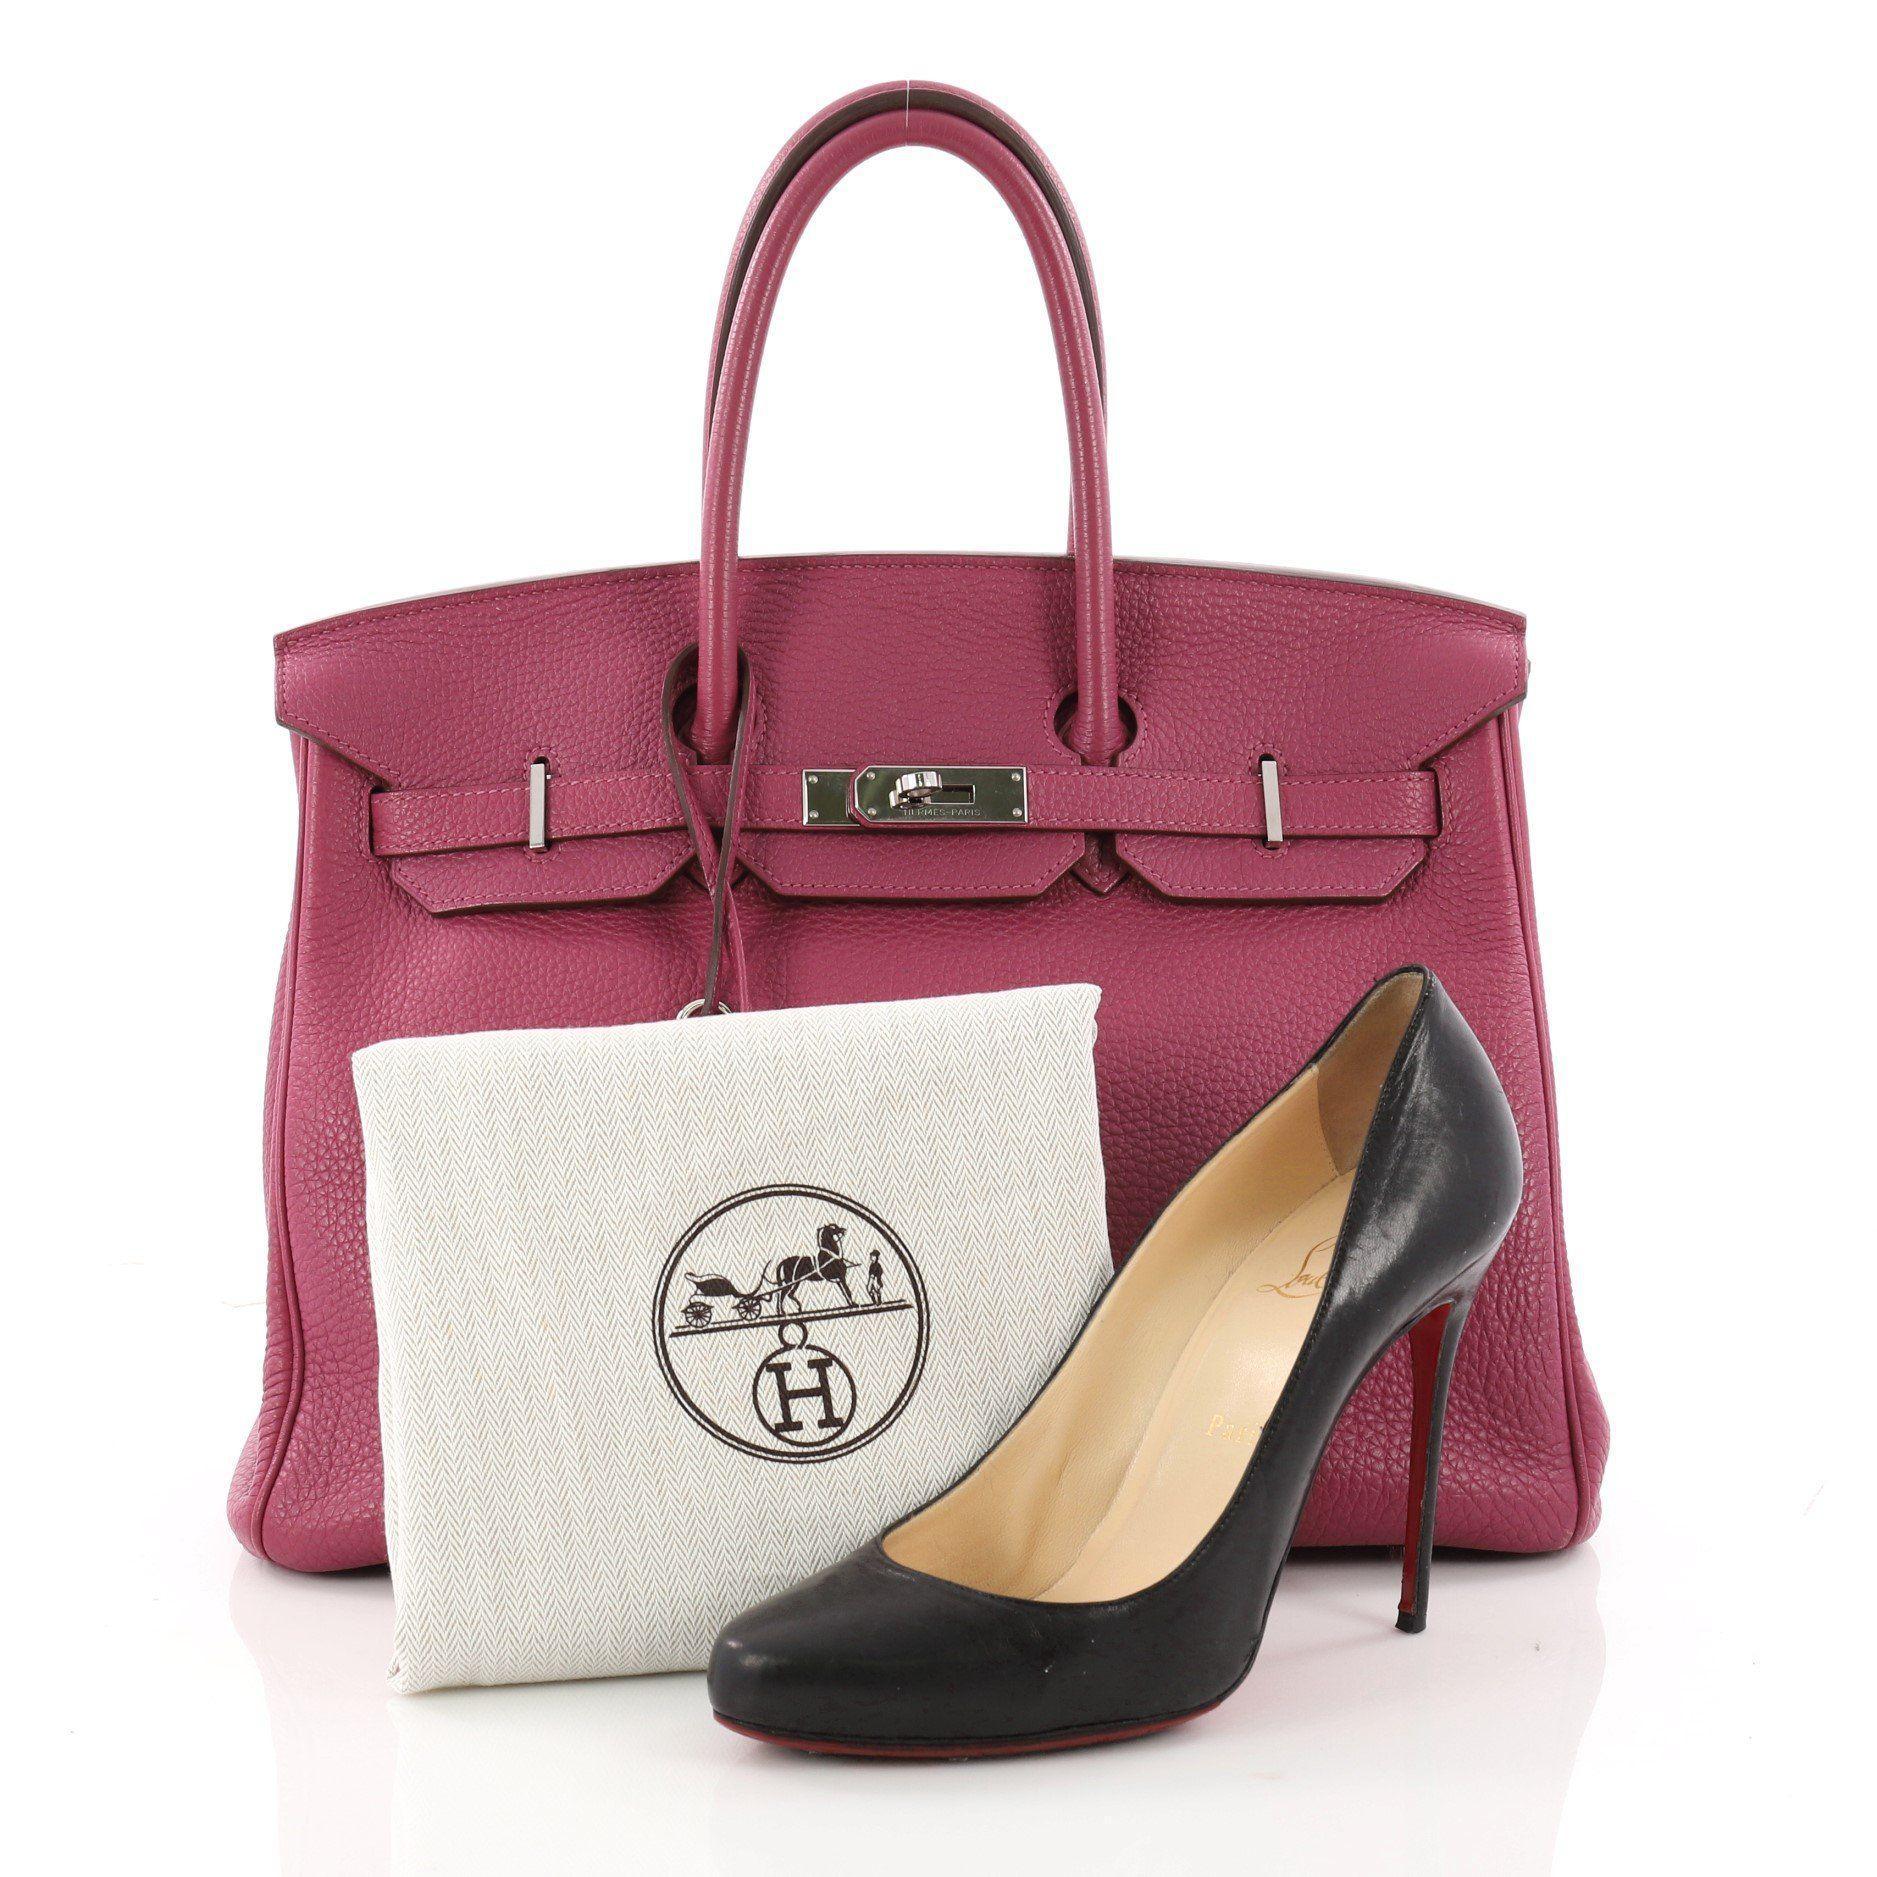 c9c68bb206df Hermès - Multicolor Pre Owned Birkin Handbag Tosca Togo With Palladium  Hardware 35 - Lyst. View fullscreen